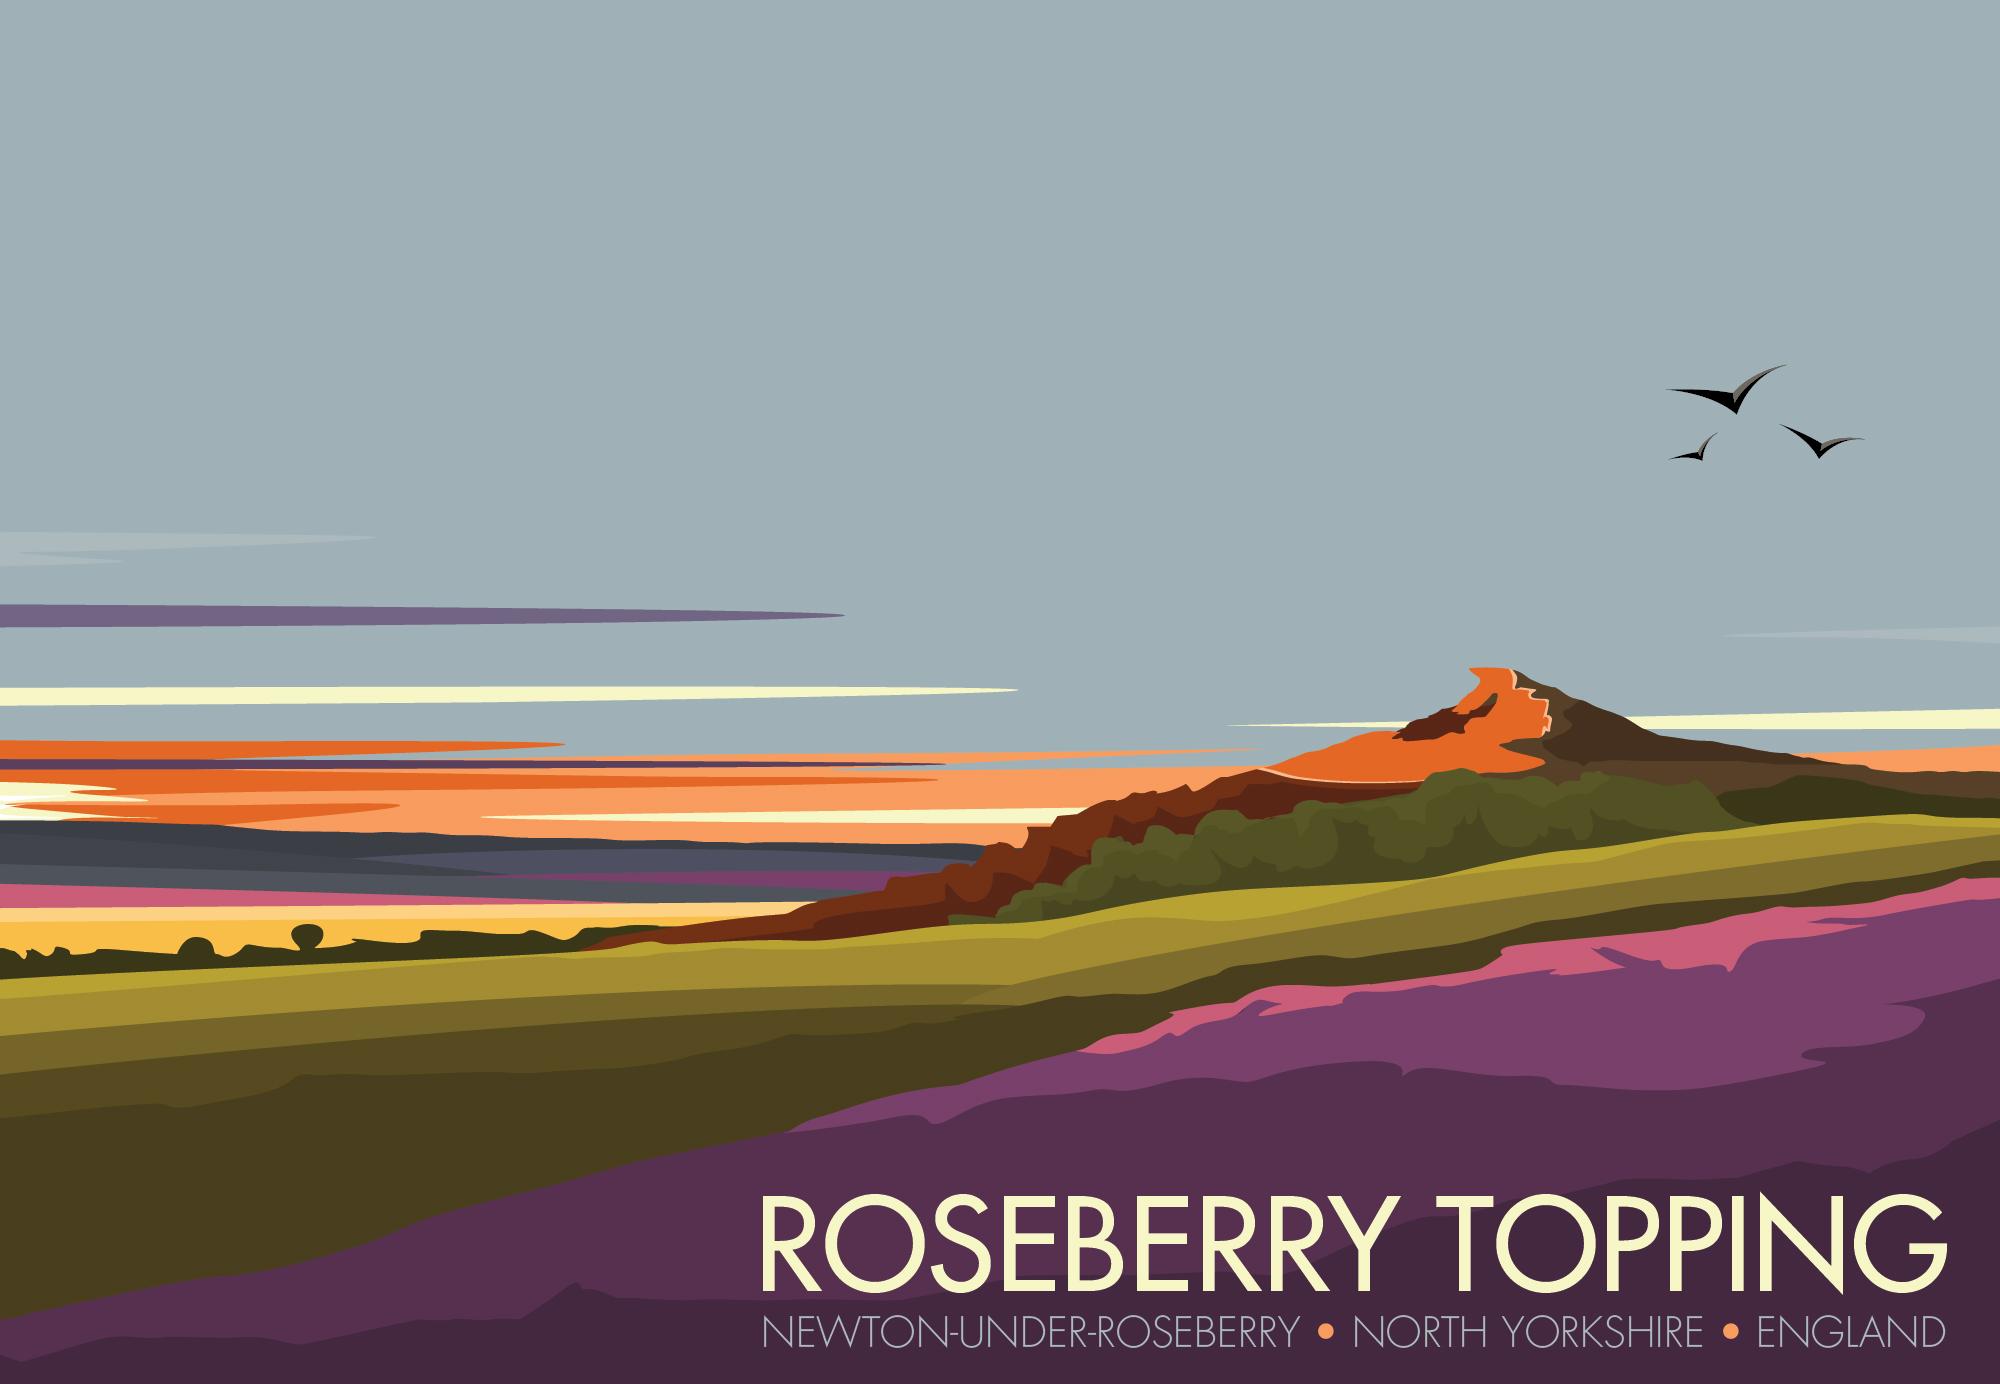 RoseberryTopping_2000_no-frame_A3